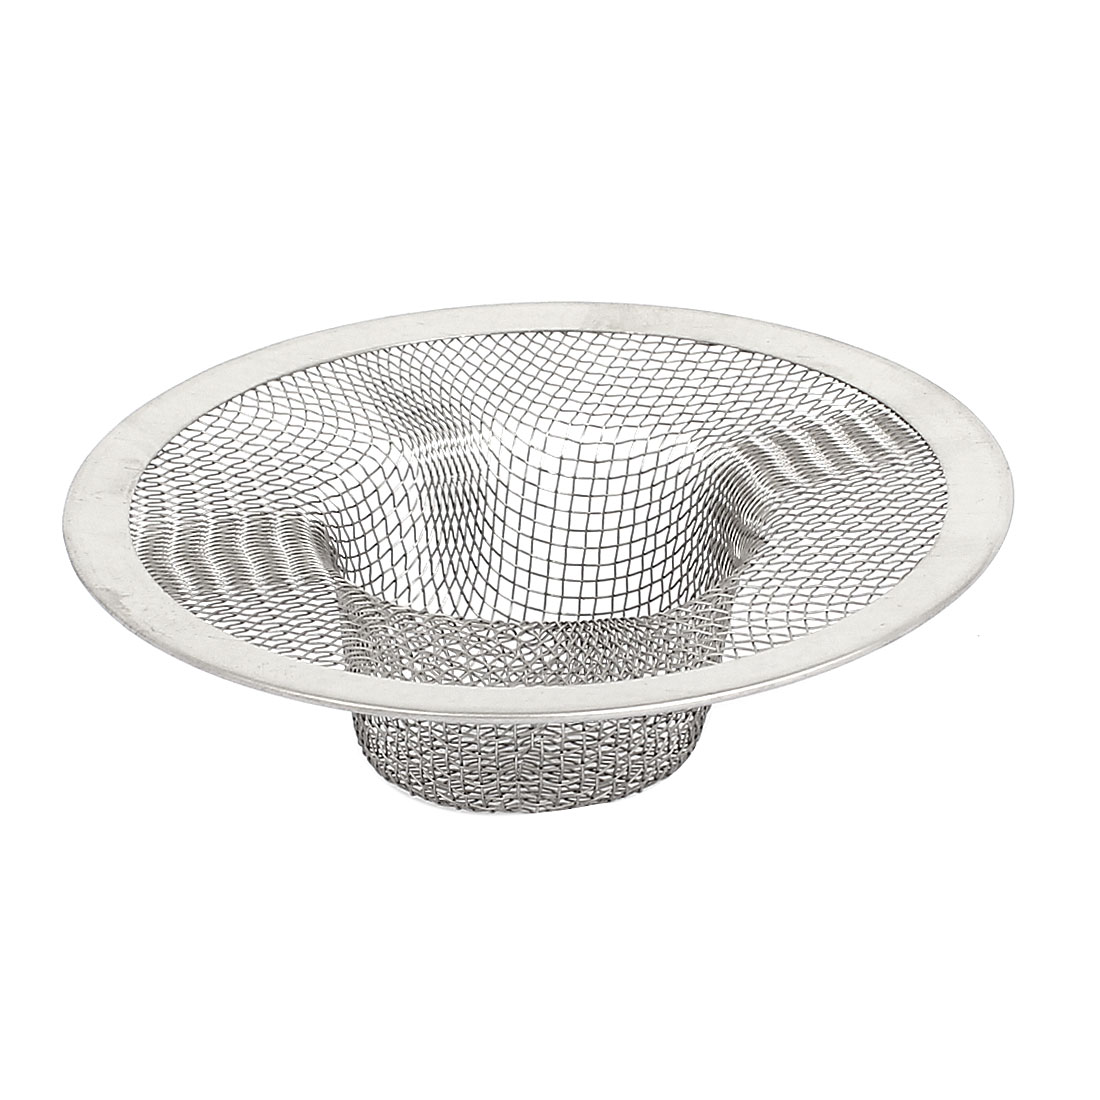 Bathroom Metal Mesh Hole Design Sink Strainer Basket Drain Bathtub Net Stoper Protector